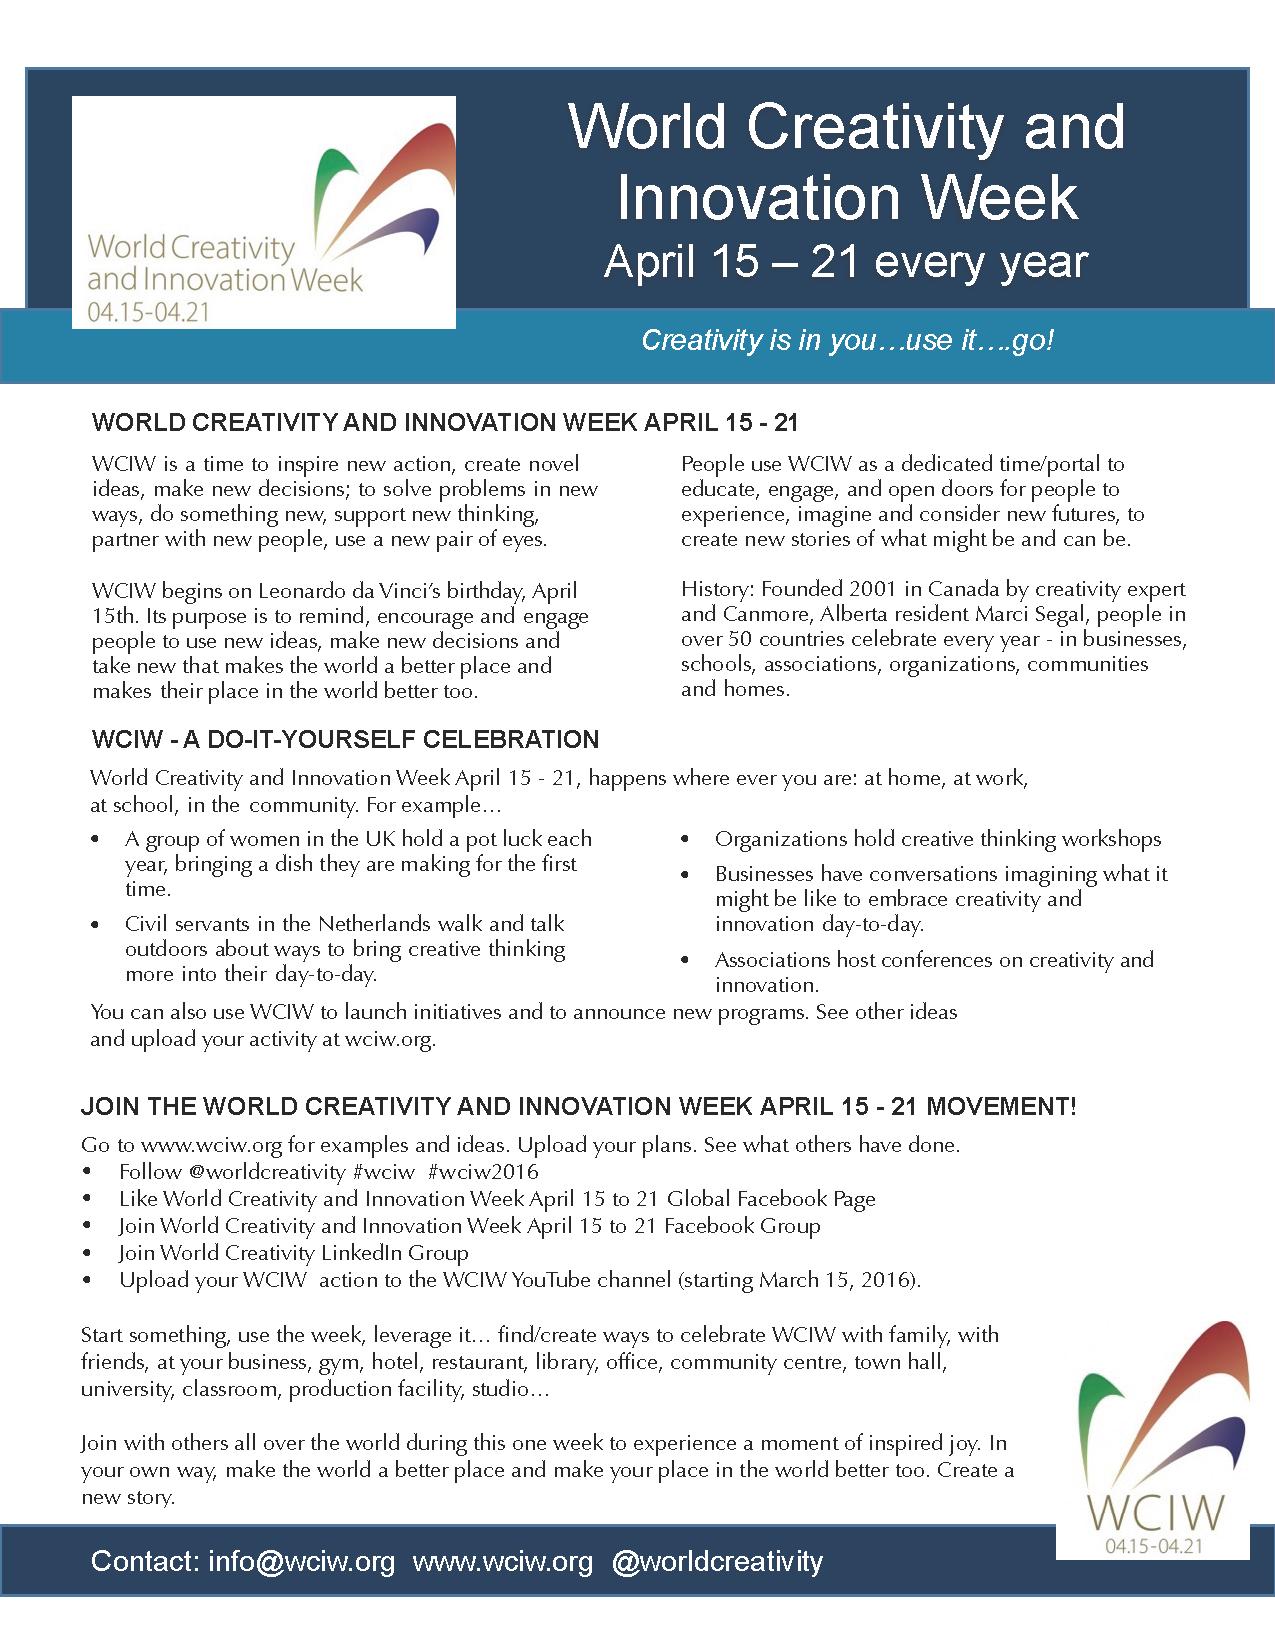 Resources | WCIW